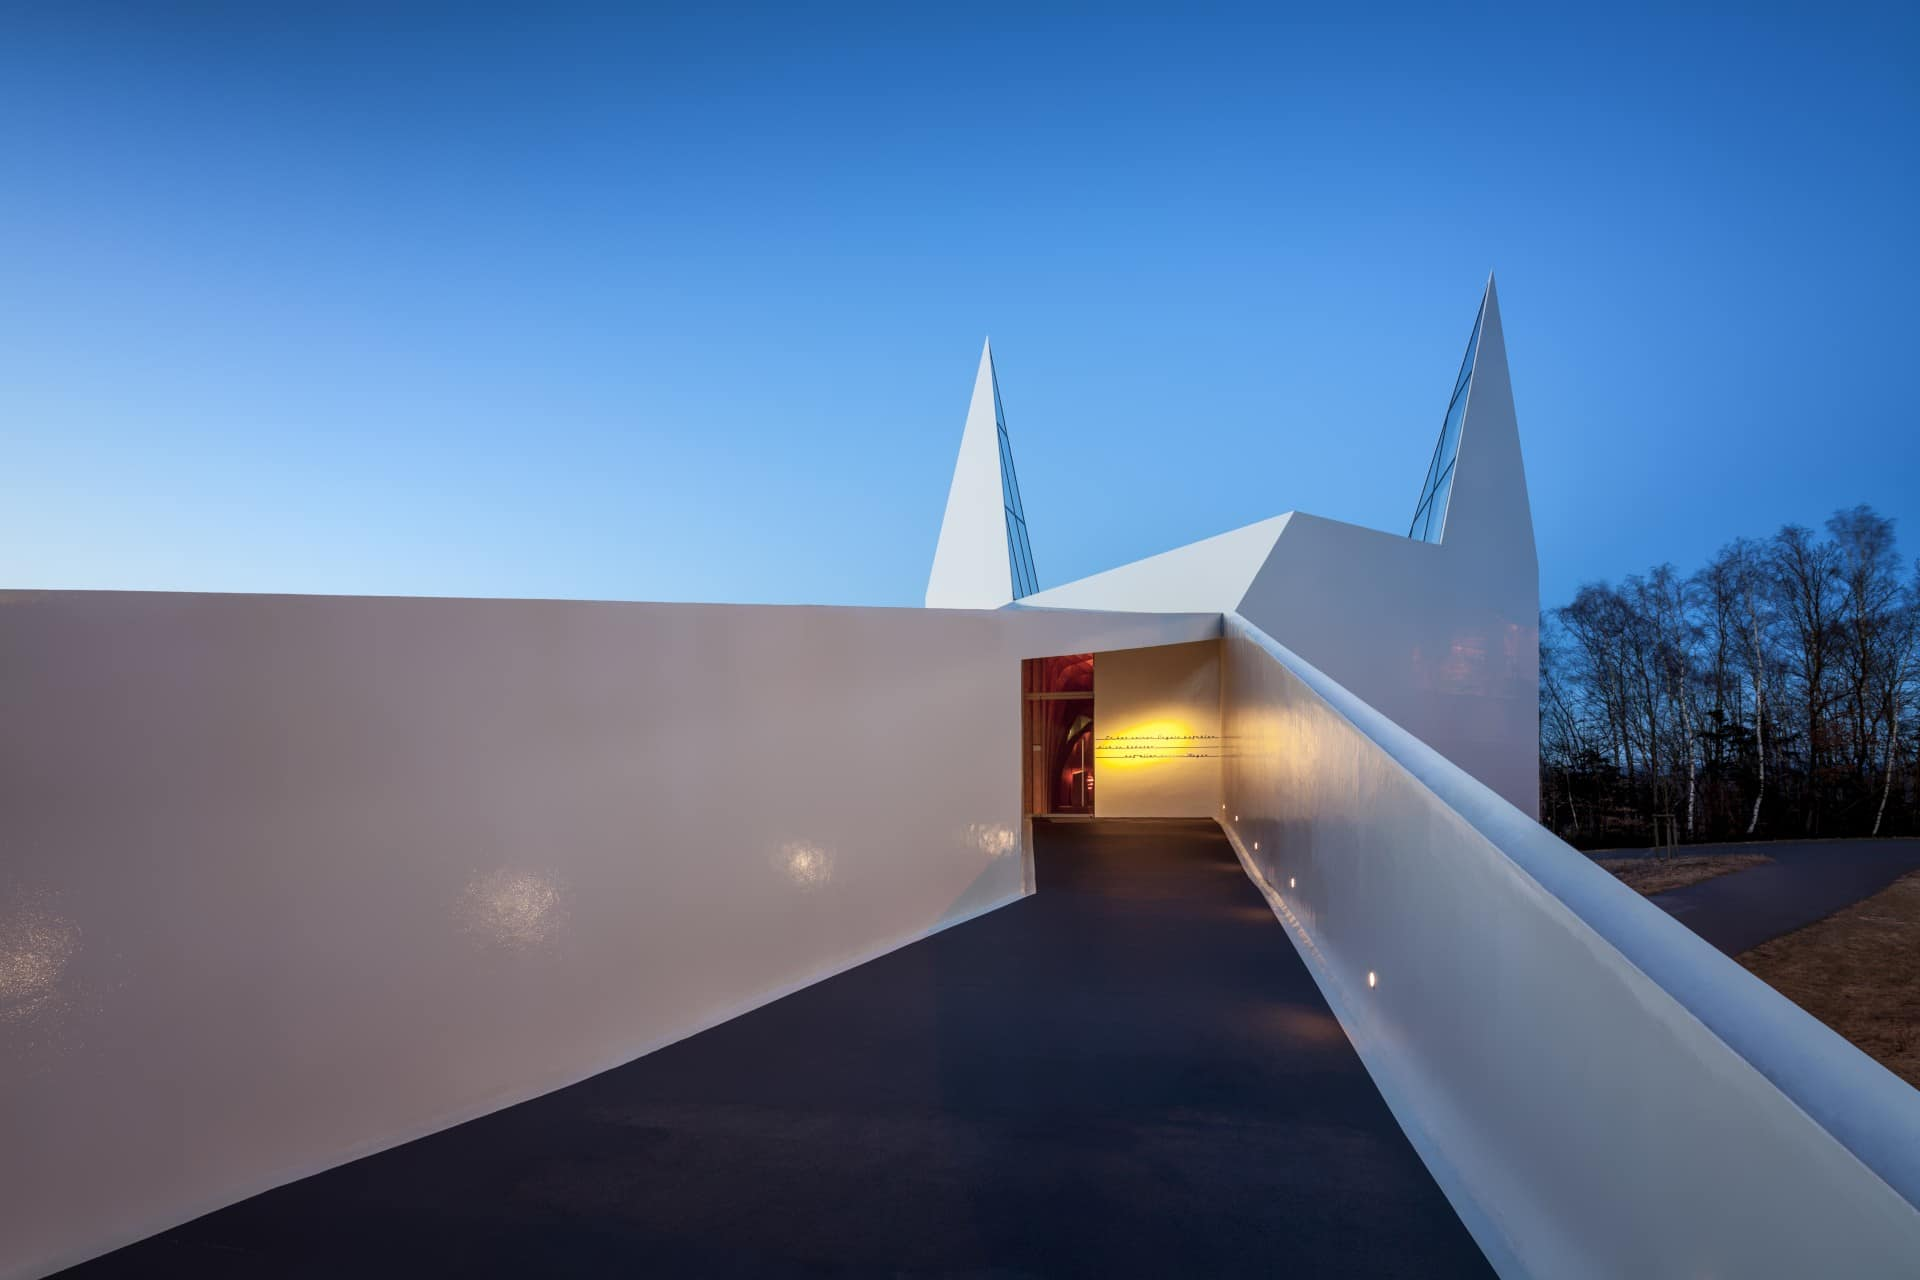 263-Chris-Franken-Architekturfotos-yMzKAYSC